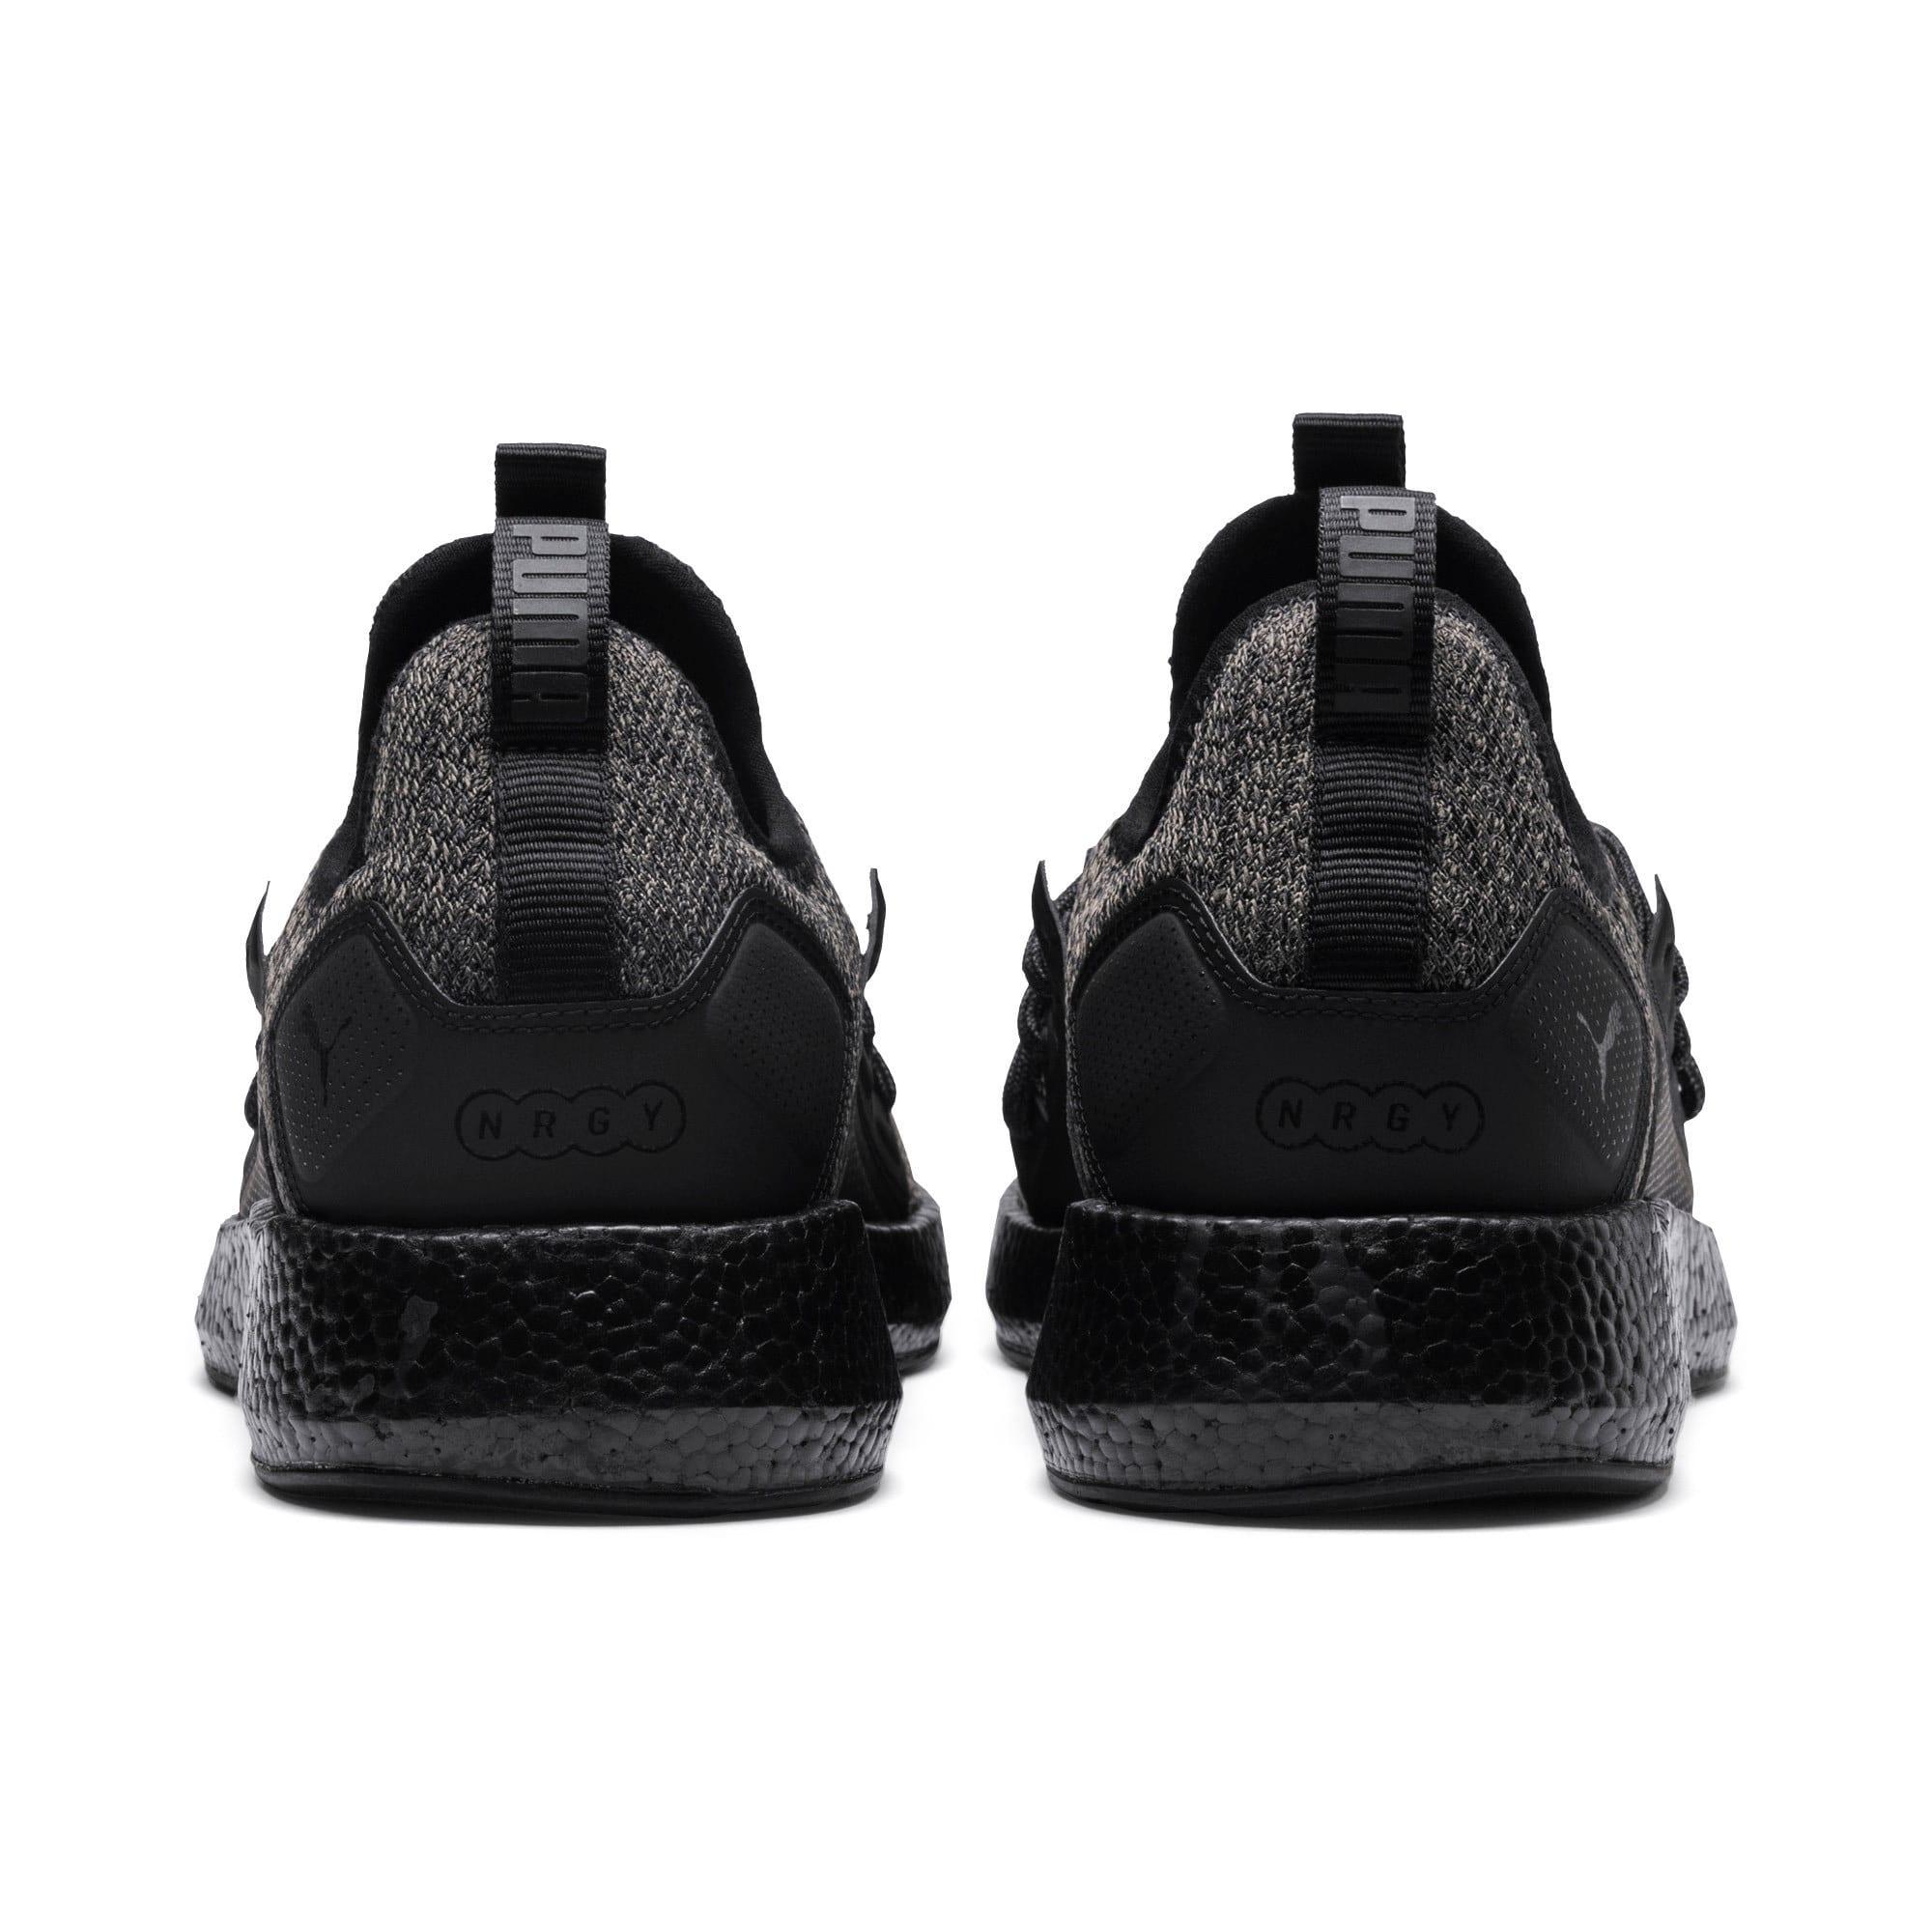 Thumbnail 3 of NRGY Neko Knit Men's Running Shoes, Puma Black-Puma Black, medium